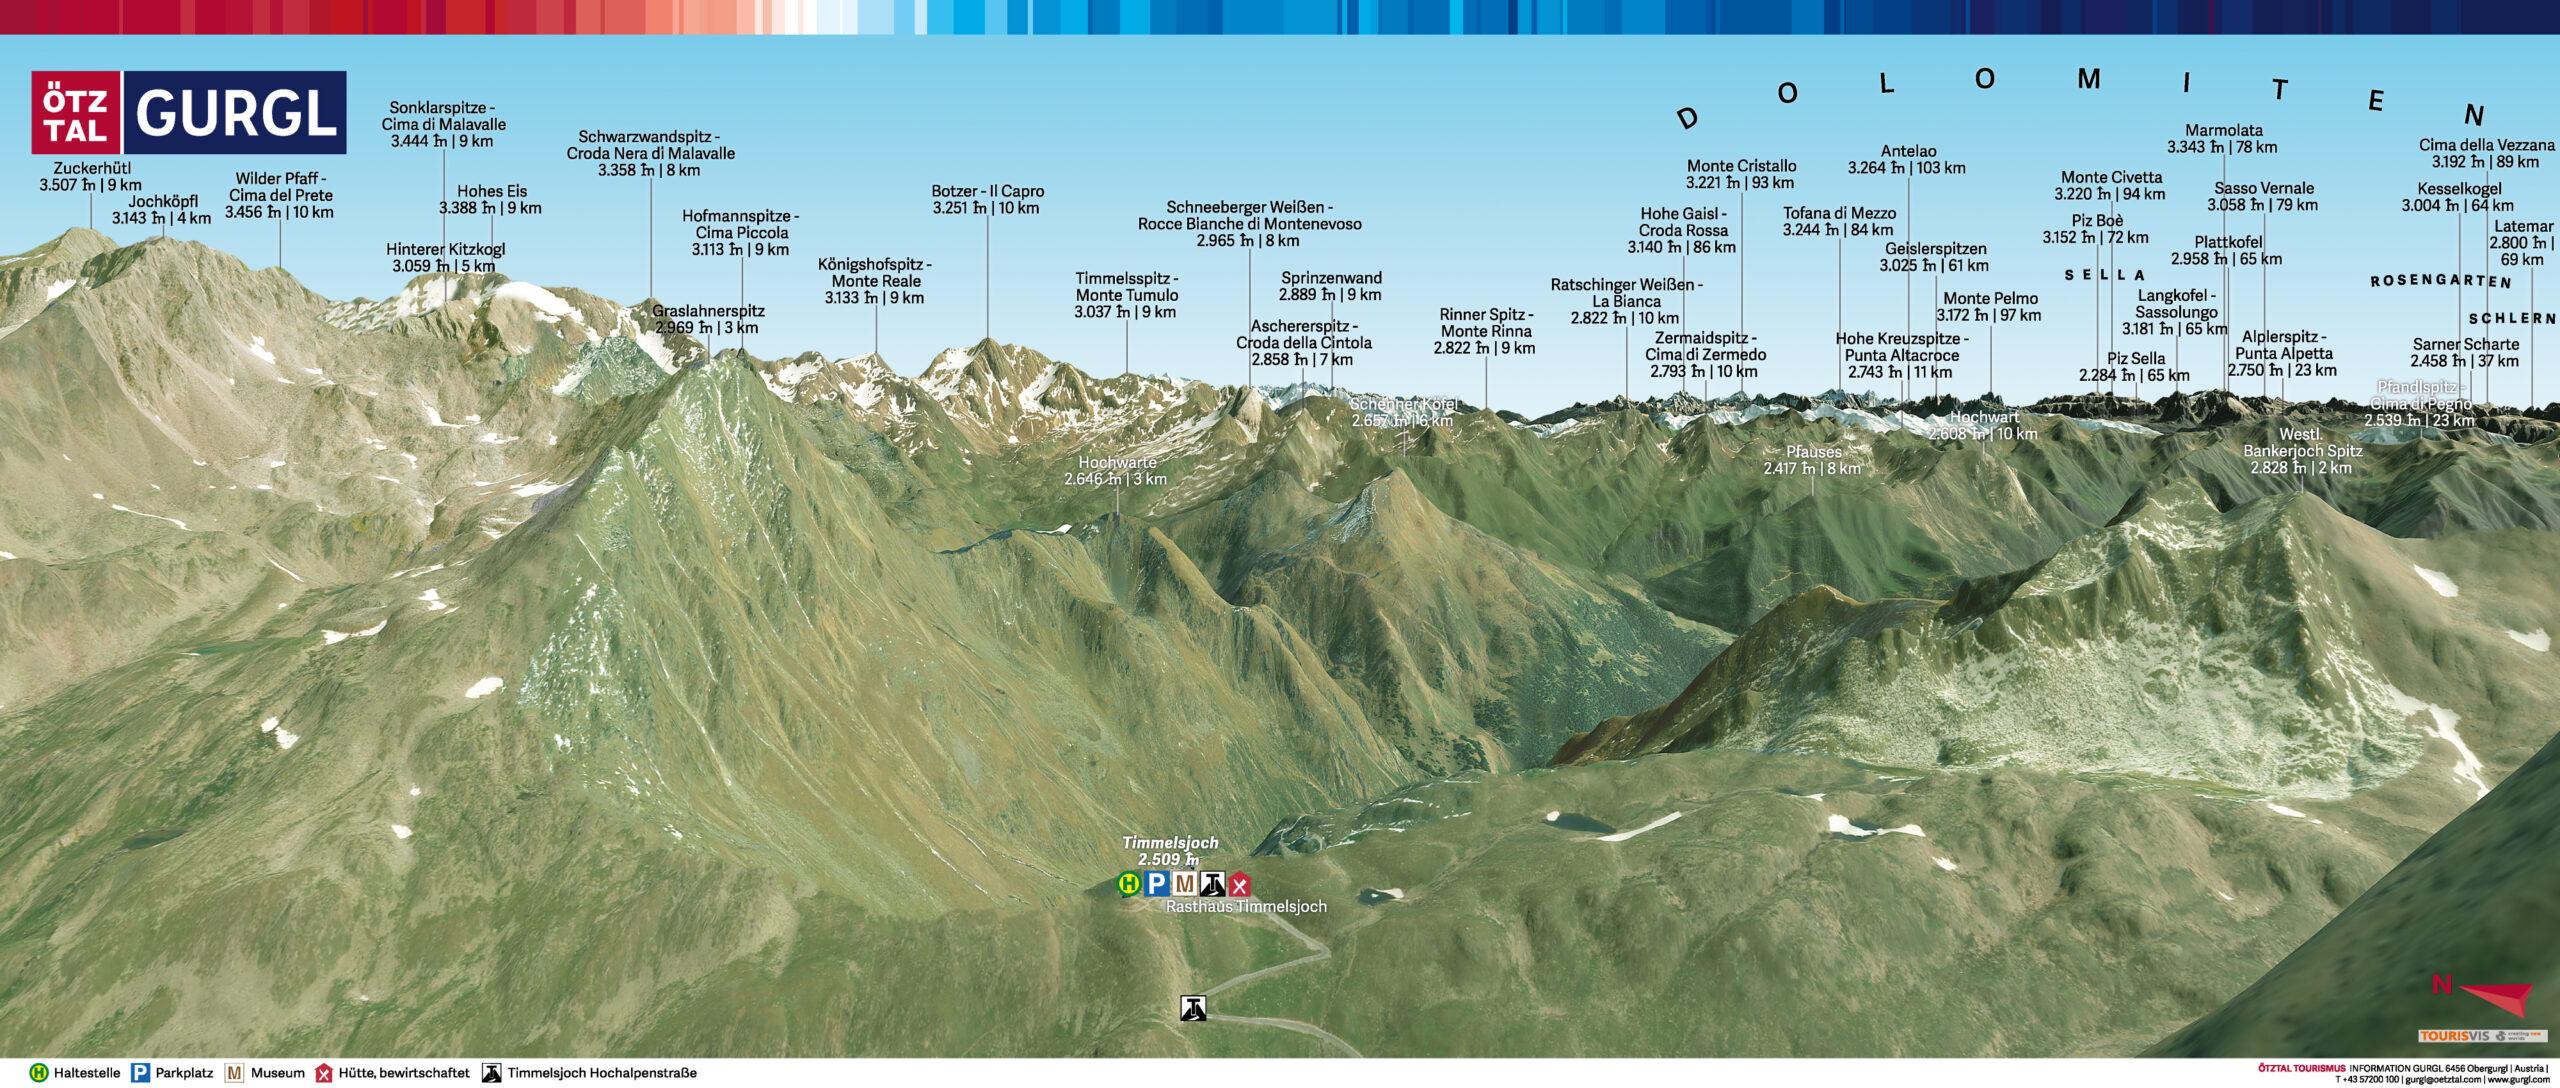 3D Gipfelpanorama - Kirchenkogel Gurgl Ötztal